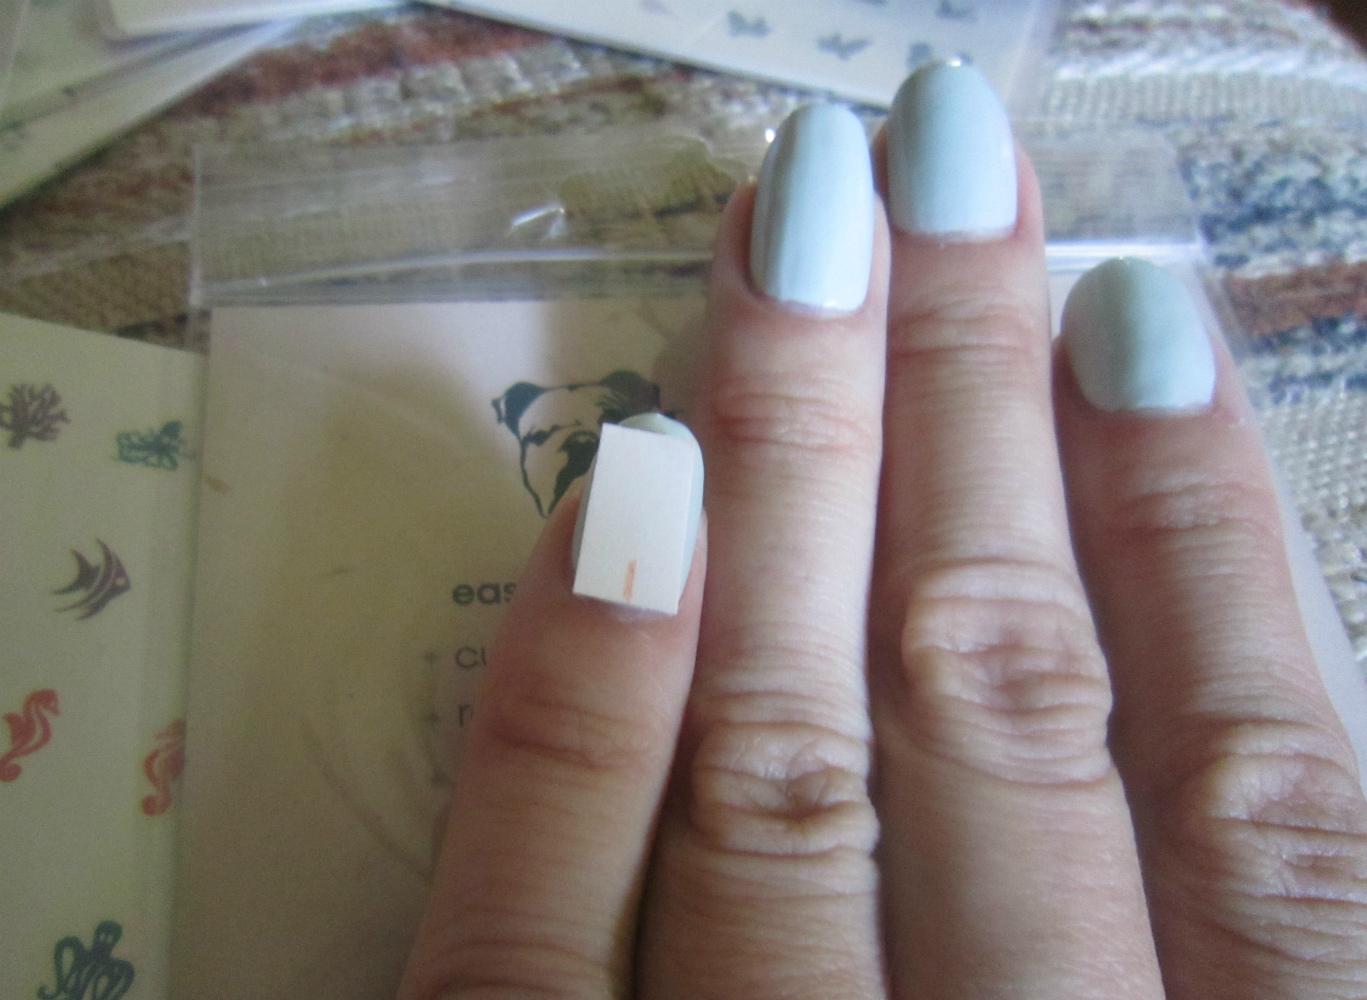 Concrete and Nail Polish: Nail Art